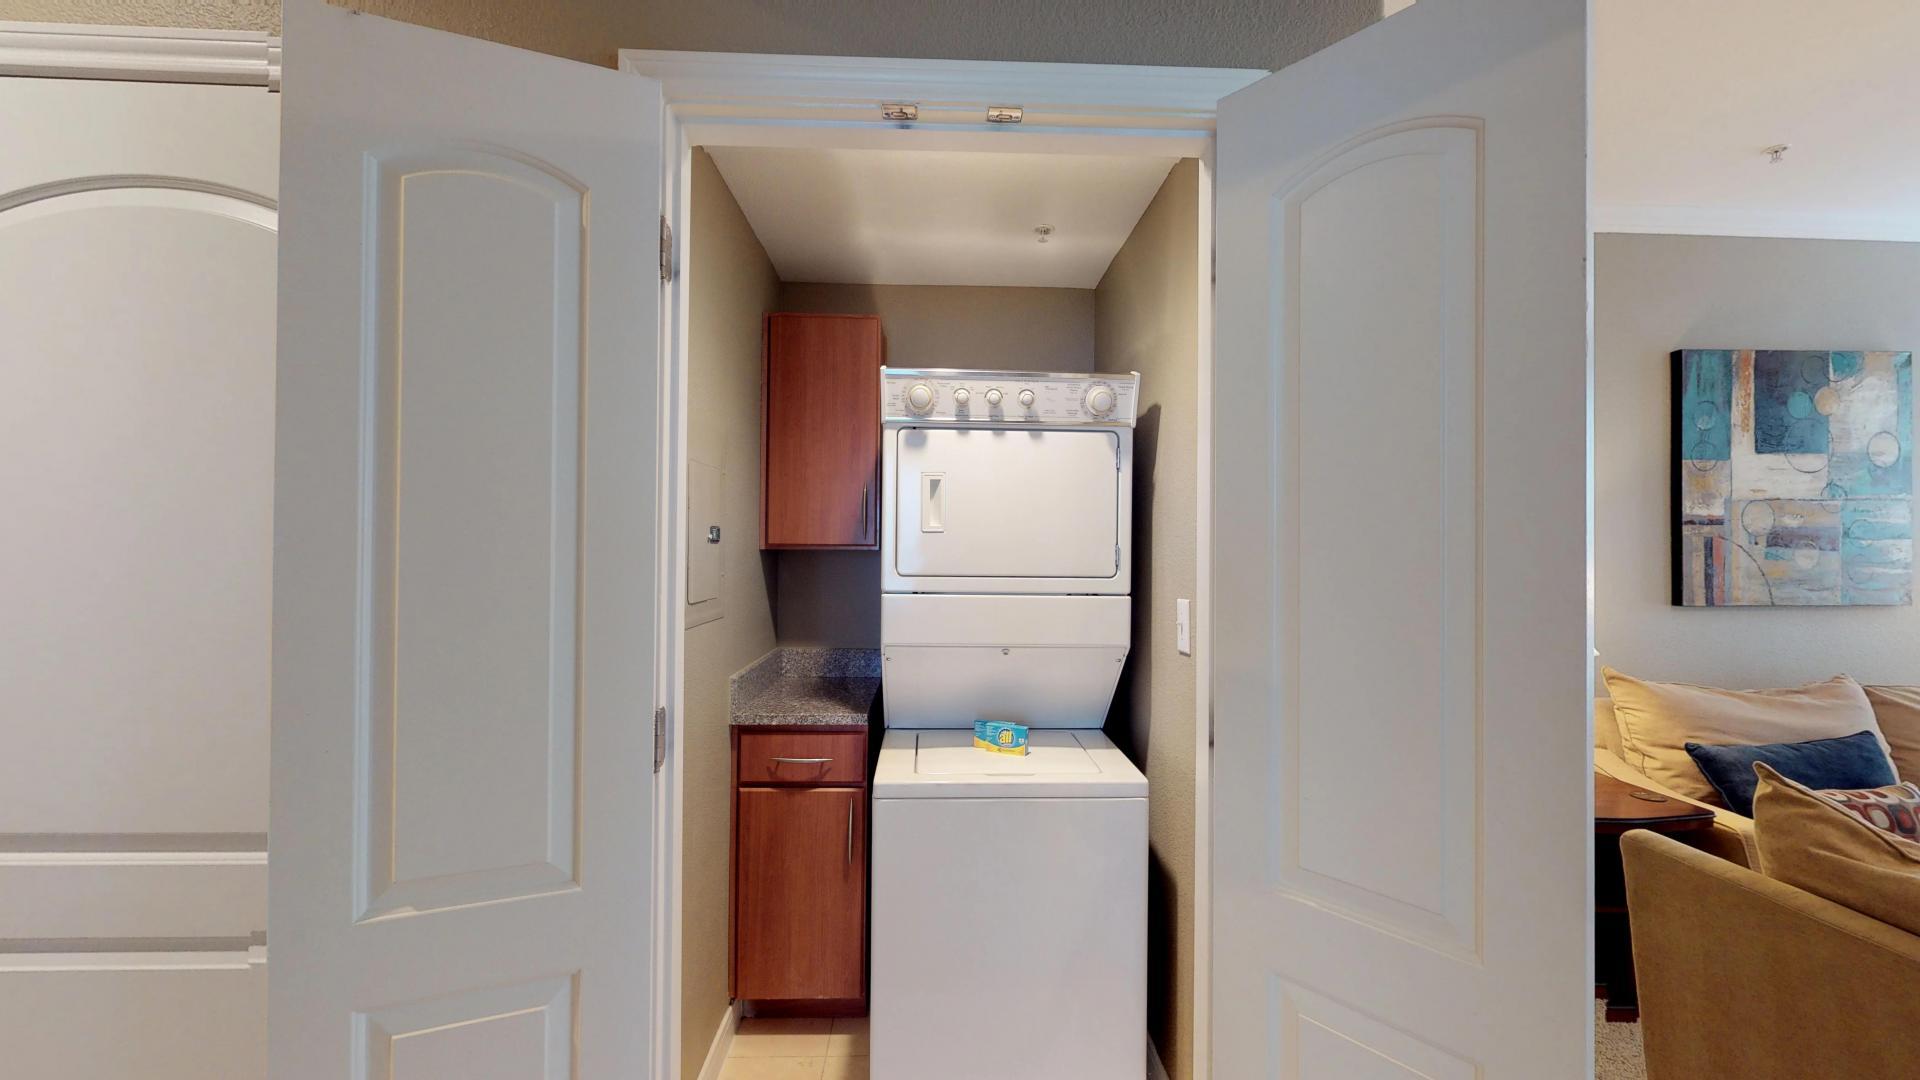 Laundry facilities at San Paloma Corporate Housing